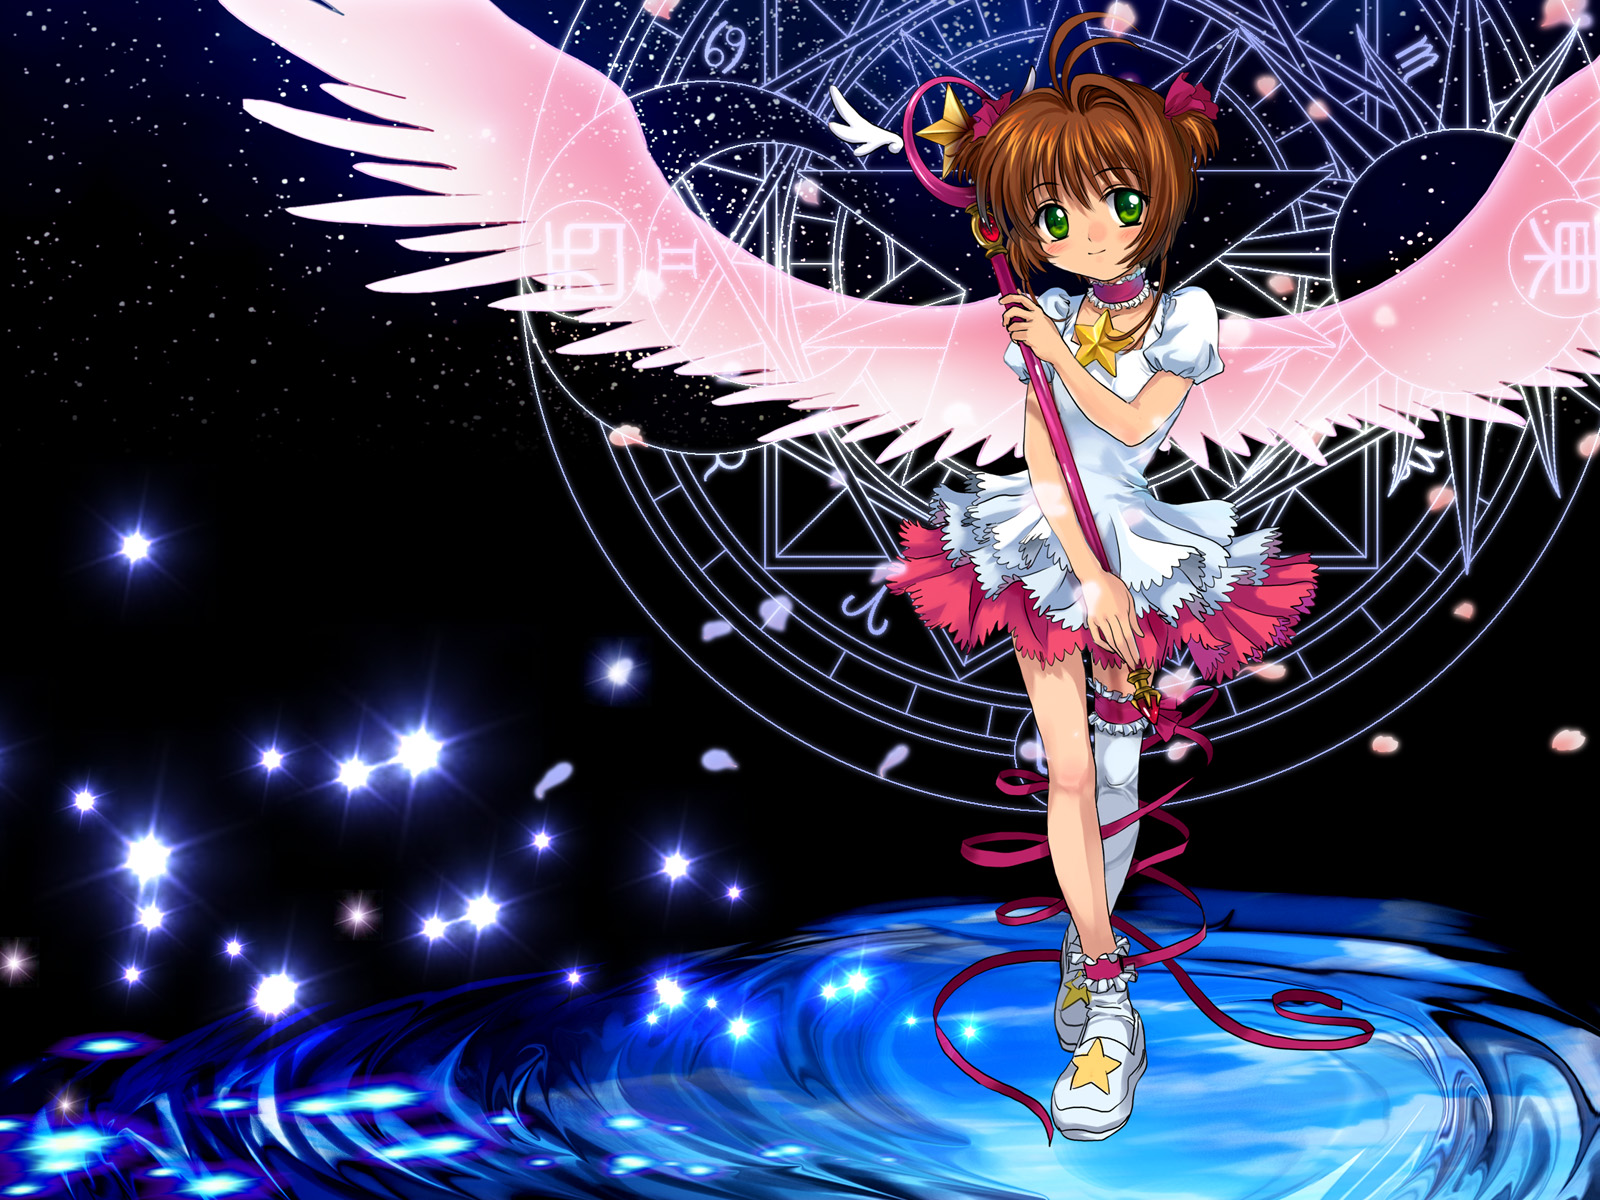 Moonlight summoner 39 s anime sekai card captor sakura - Sakura desktop ...